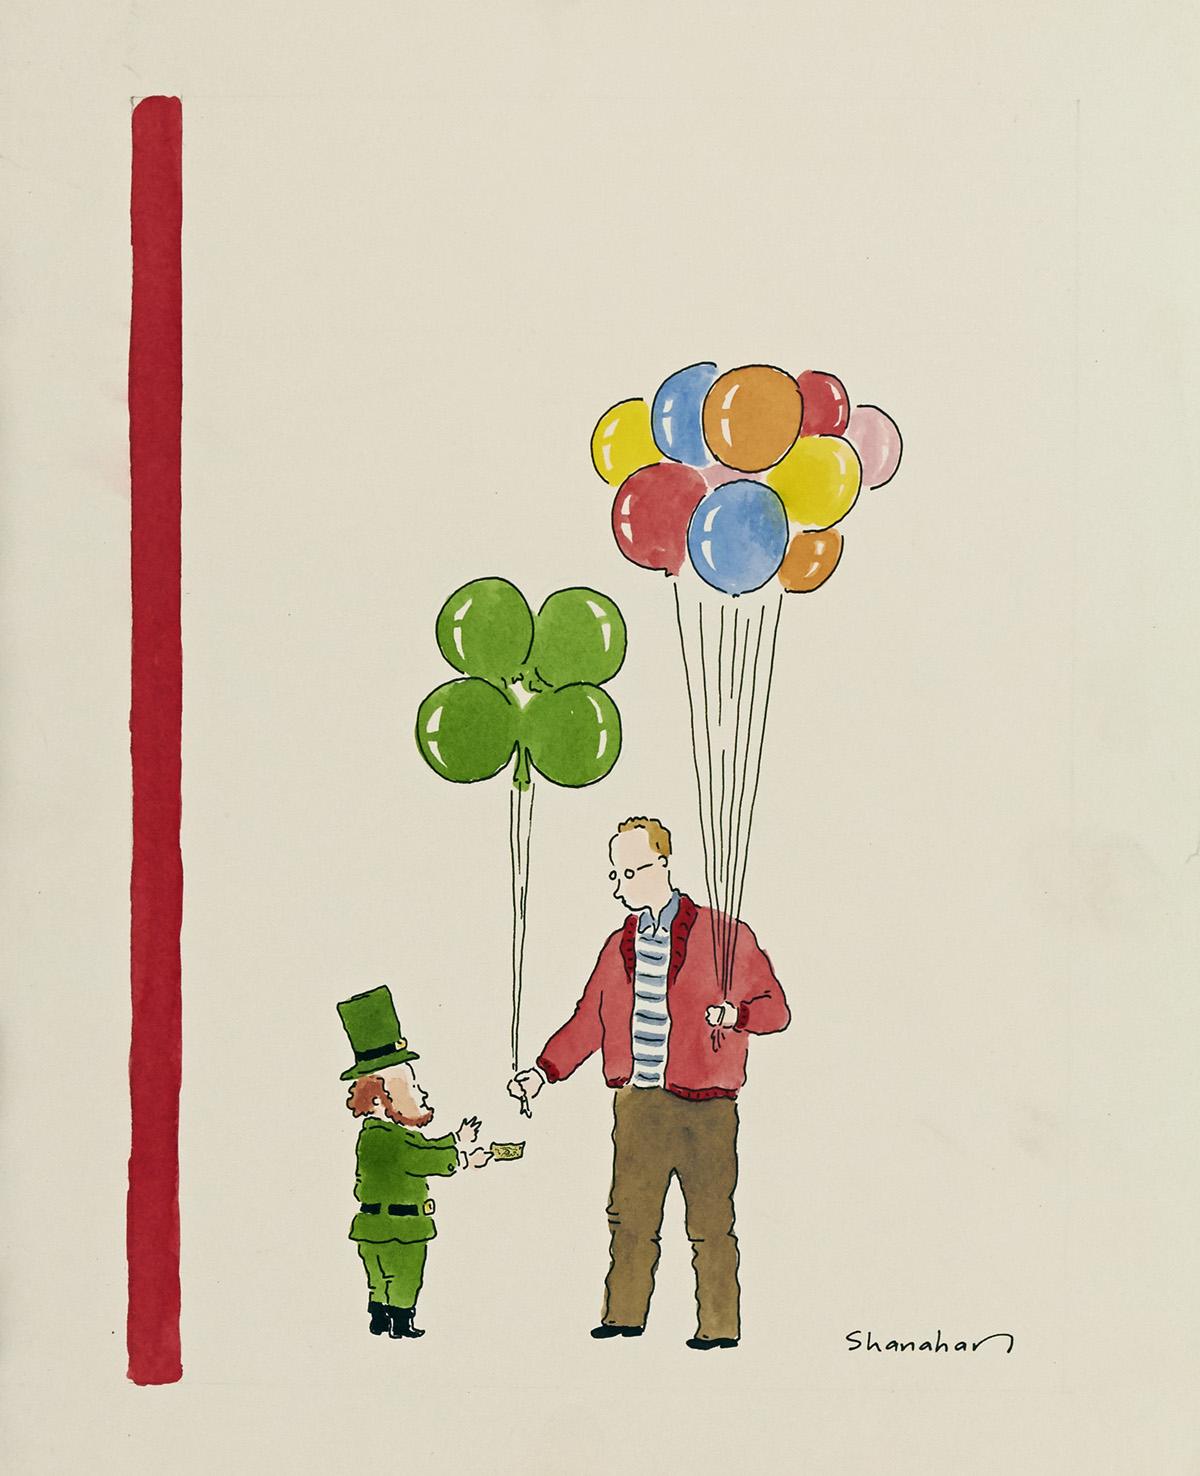 DANNY SHANAHAN. St. Paddys Balloons. [NEW YORKER / COVER ART / ST. PATRICKS DAY]